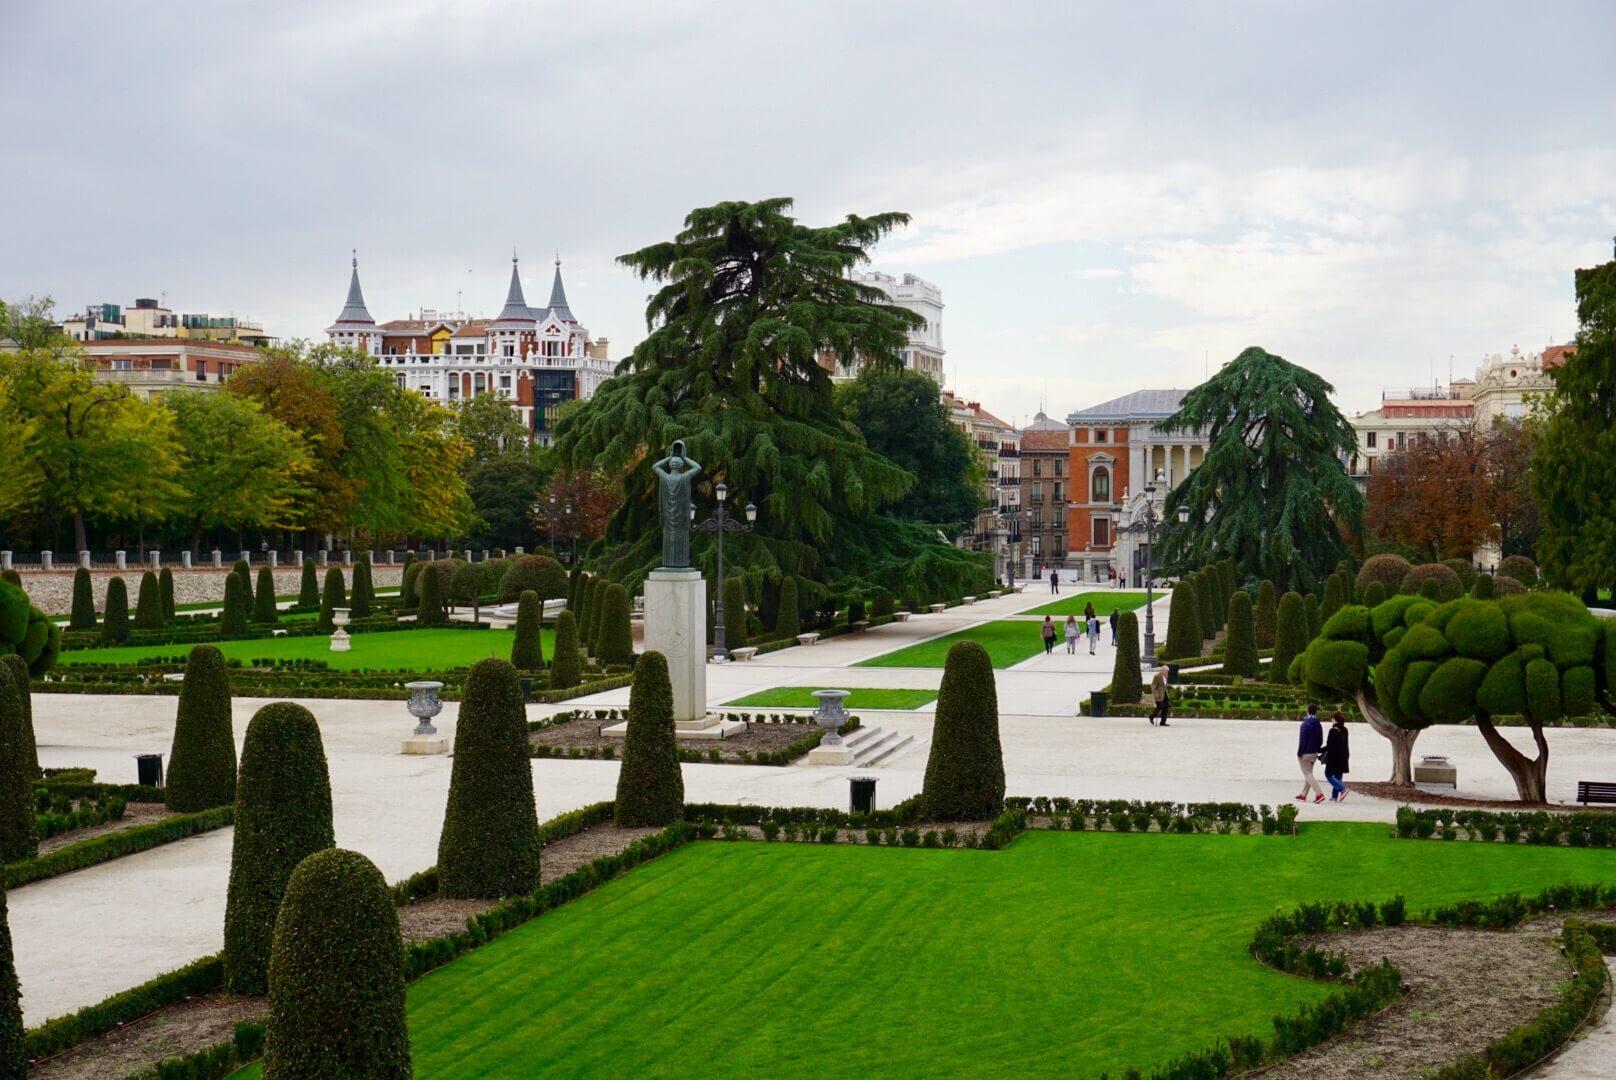 Parque del Retiro - A Madrid Self Guided Photography Tour